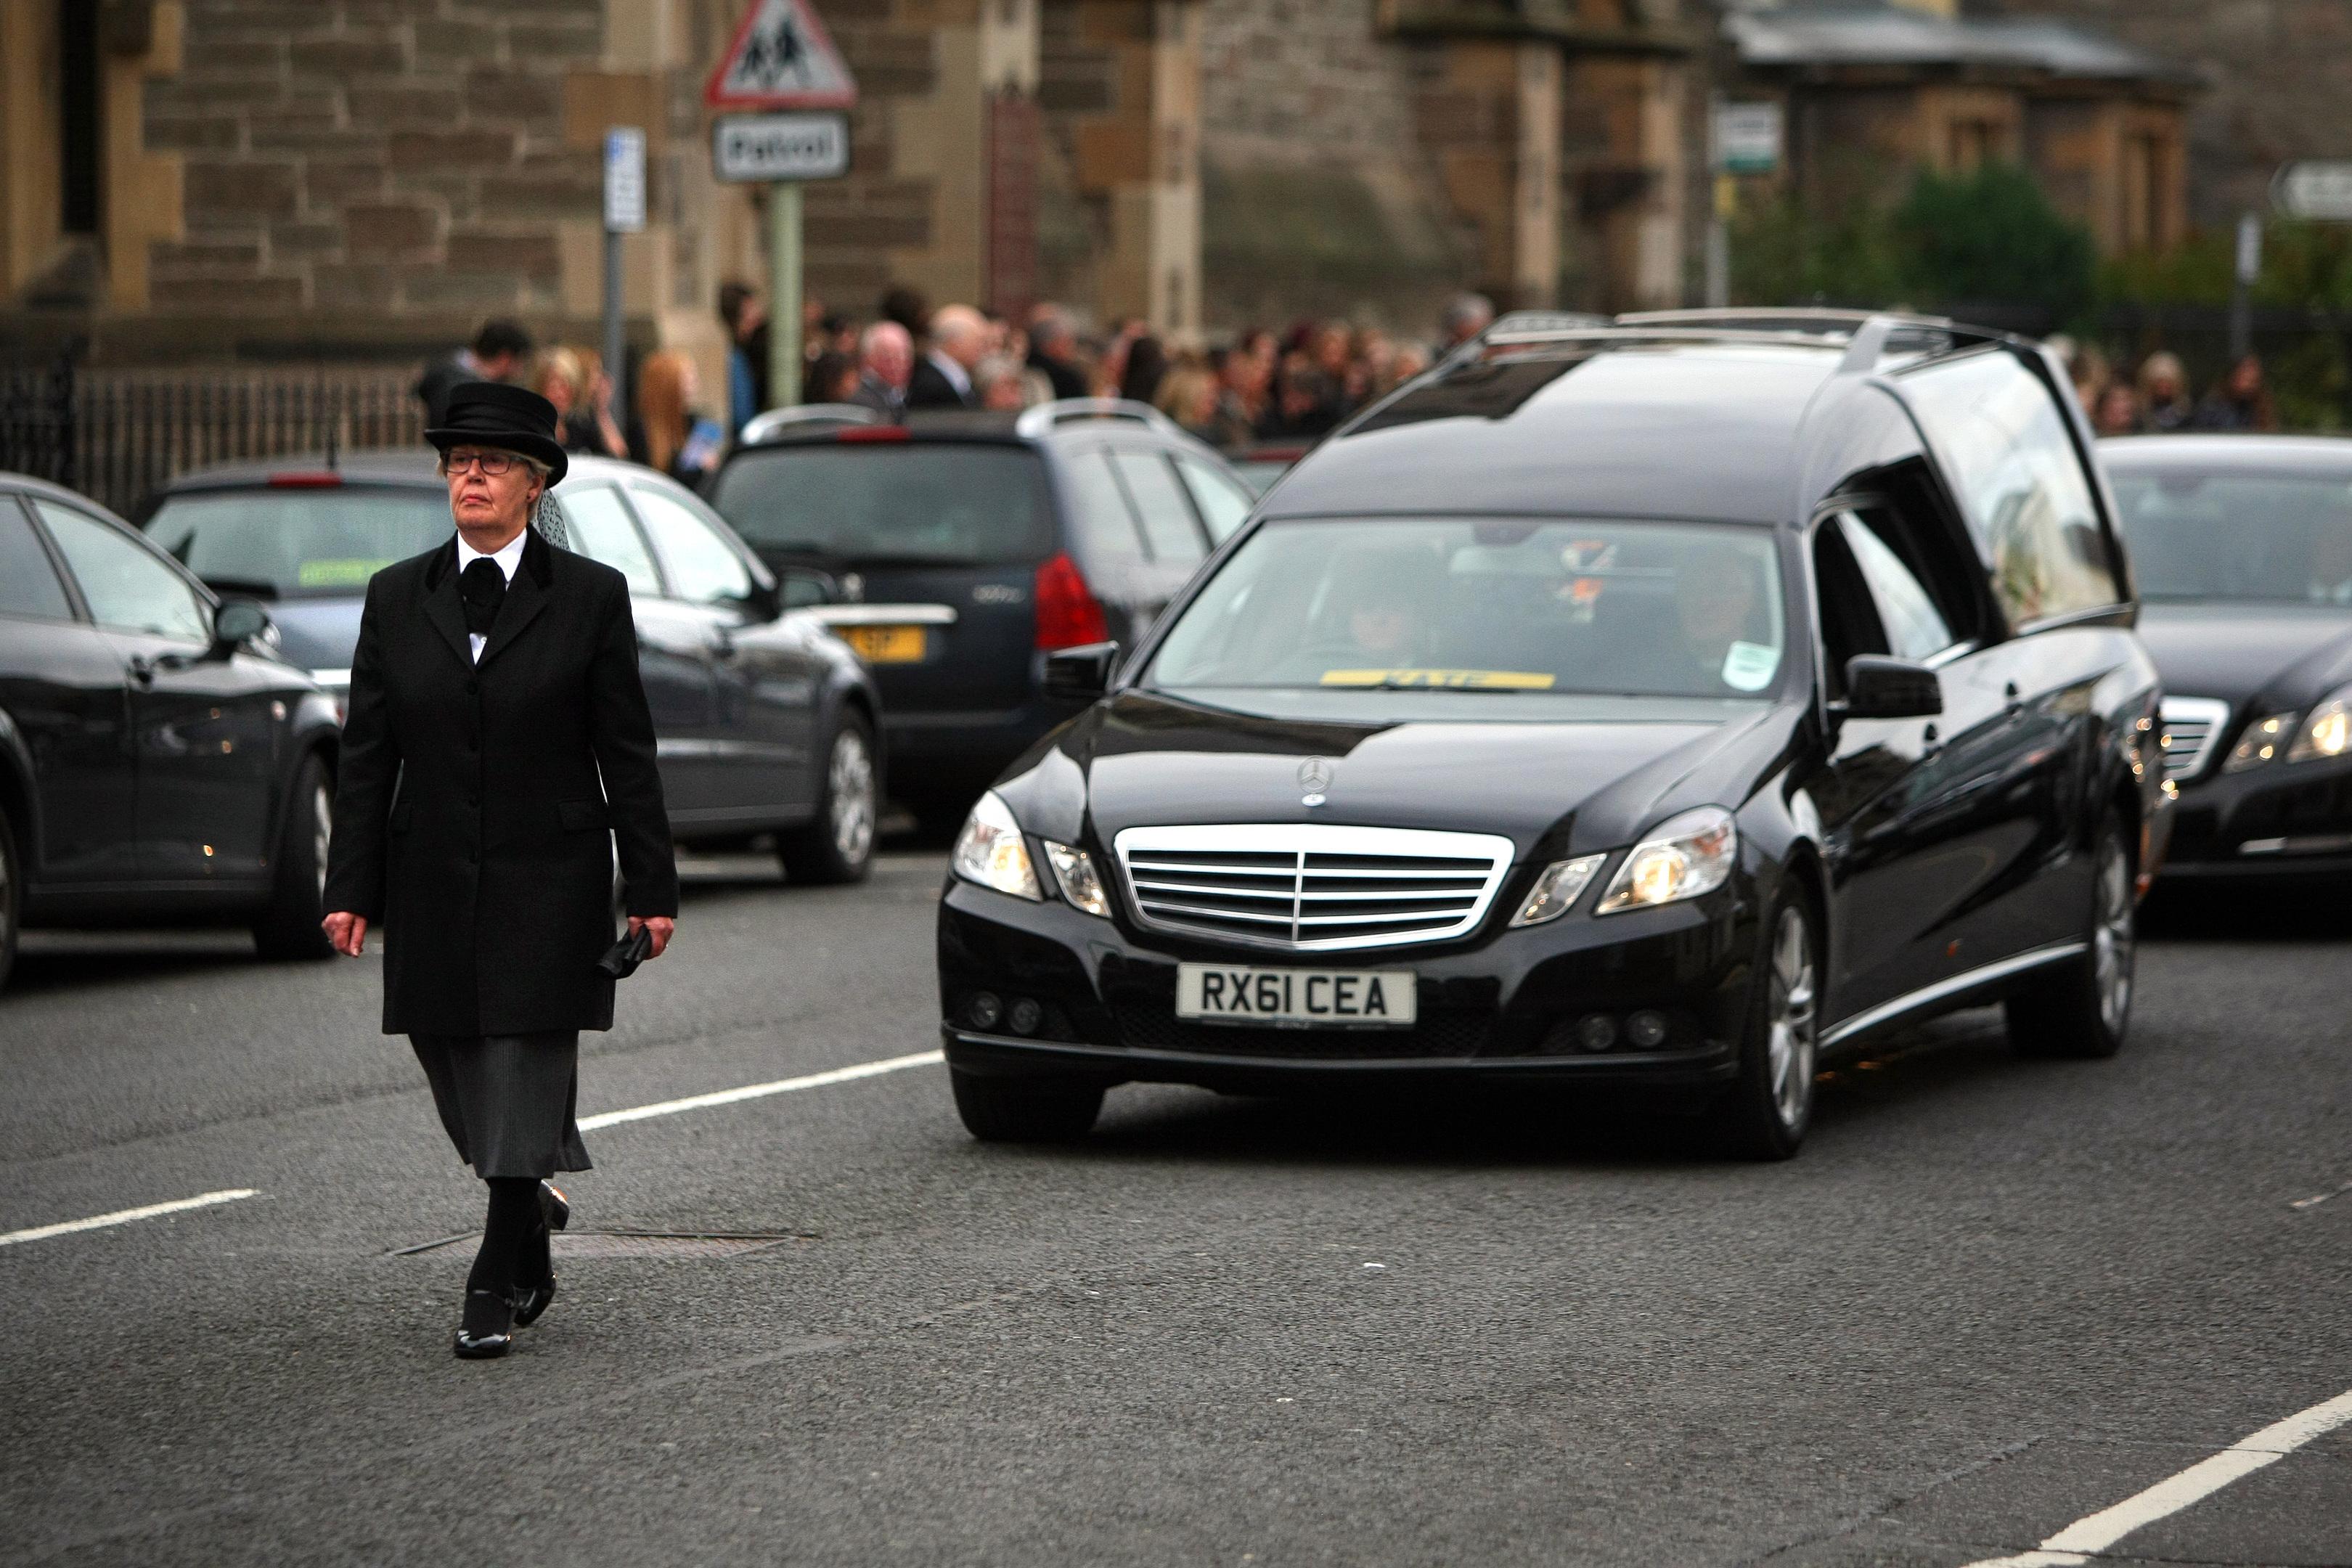 The hearse leaving the church.